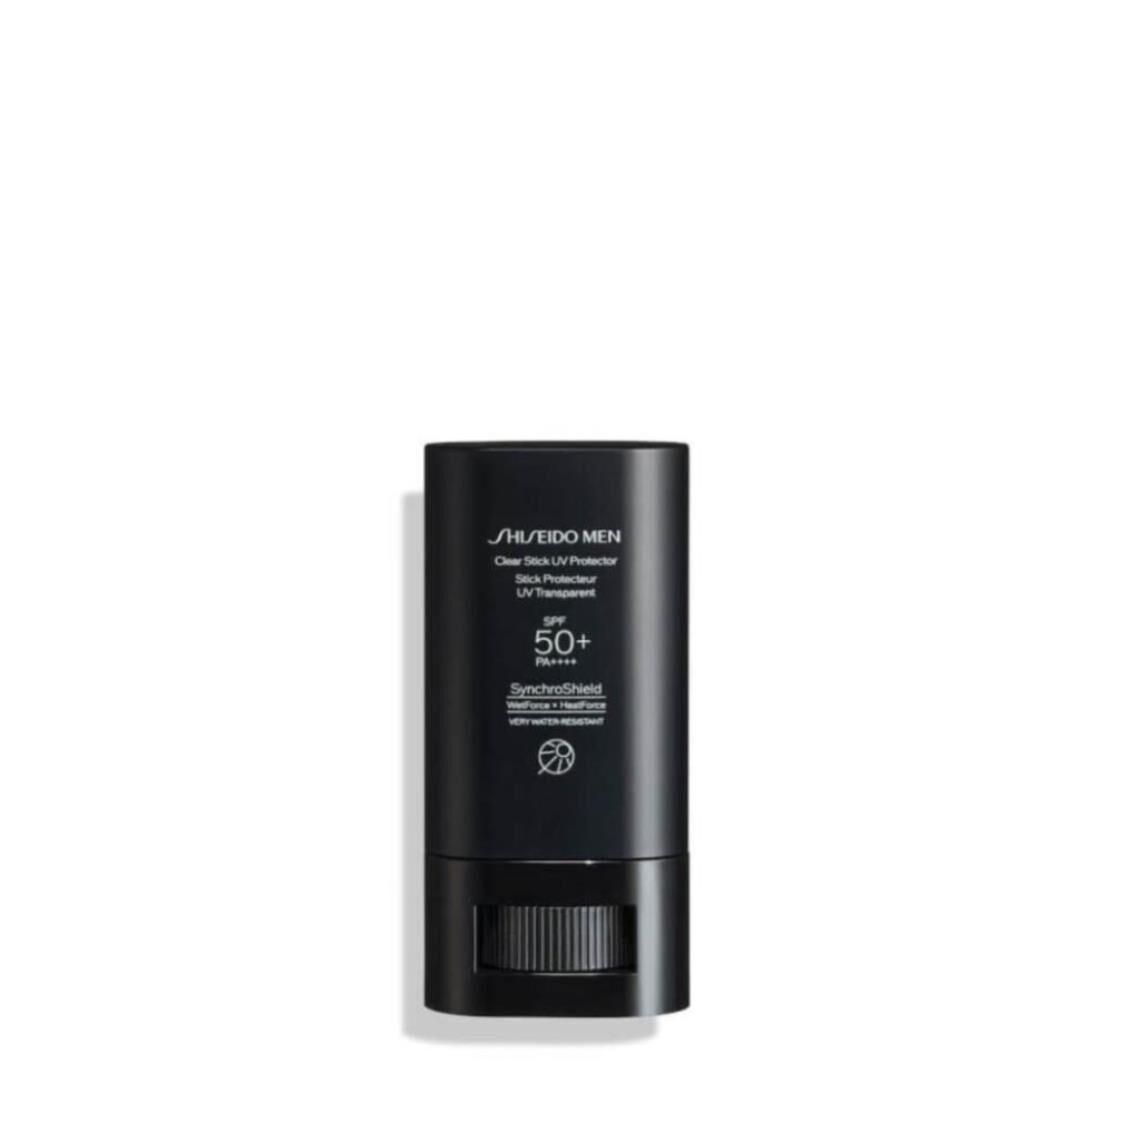 Shiseido Men Clear Stick UV Protector SPF 50